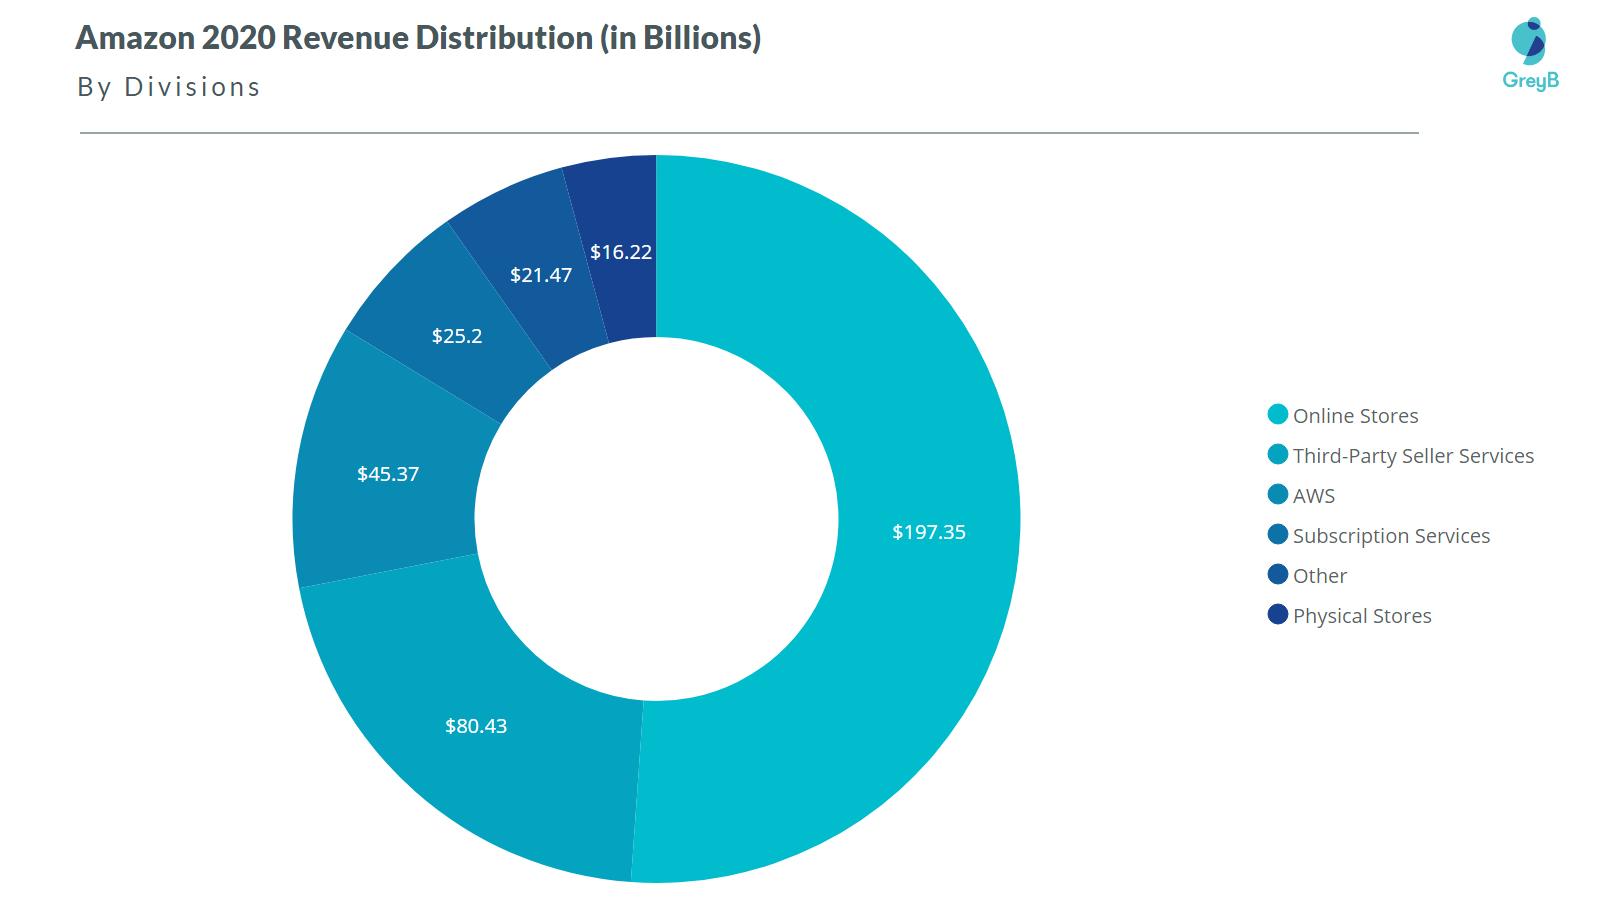 Amazon 2020 Revenue Division wise